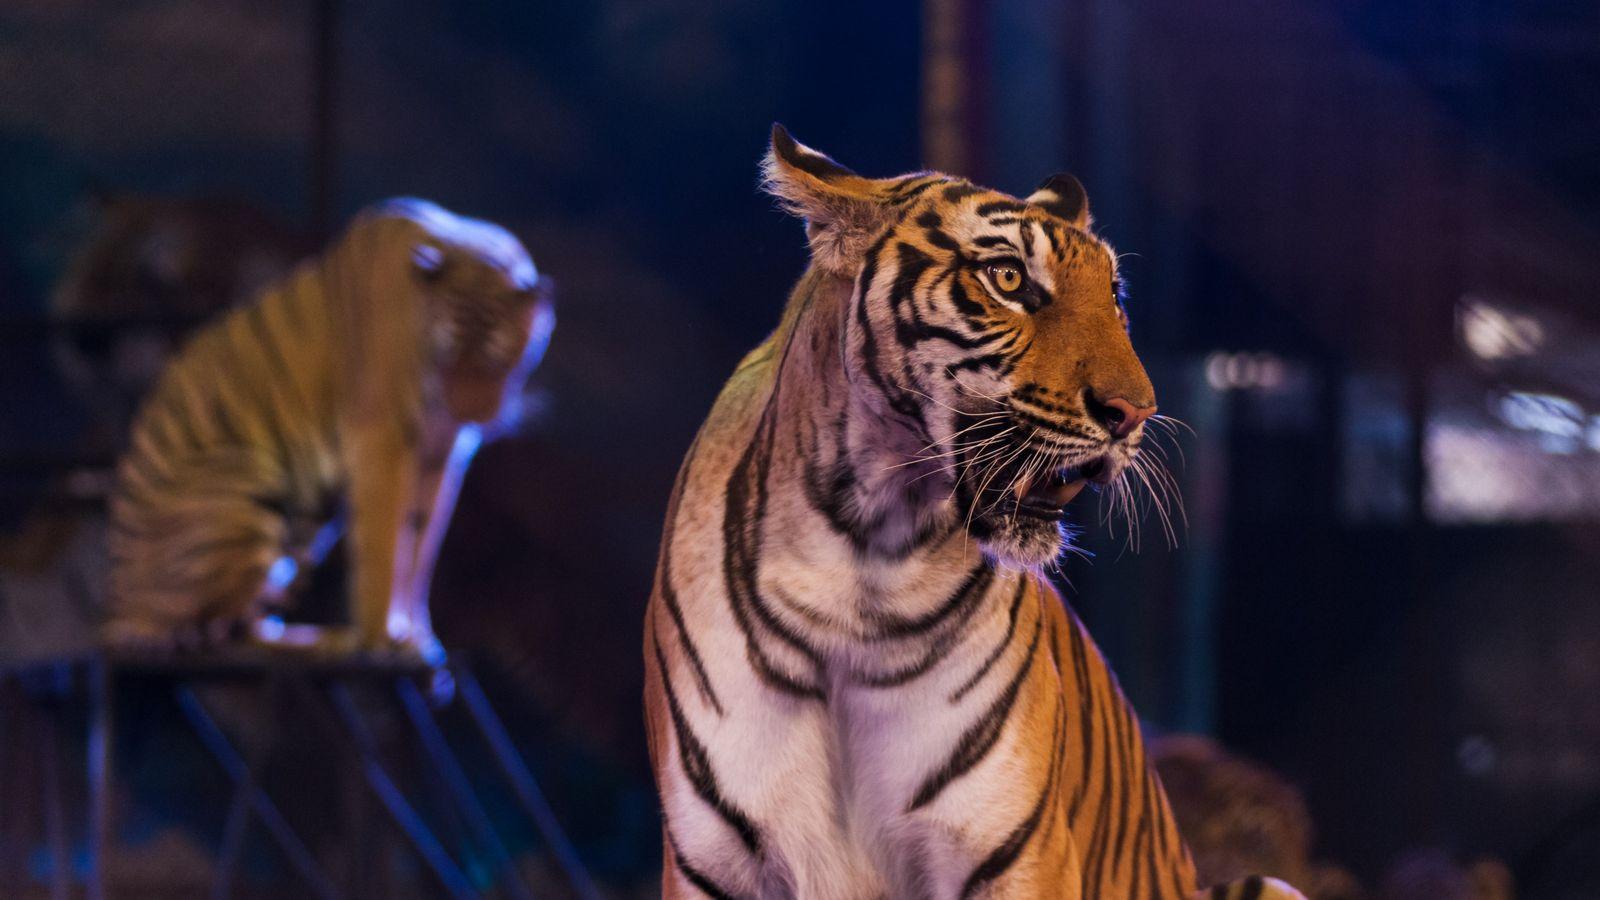 Des tigres dans une arène de cirque.